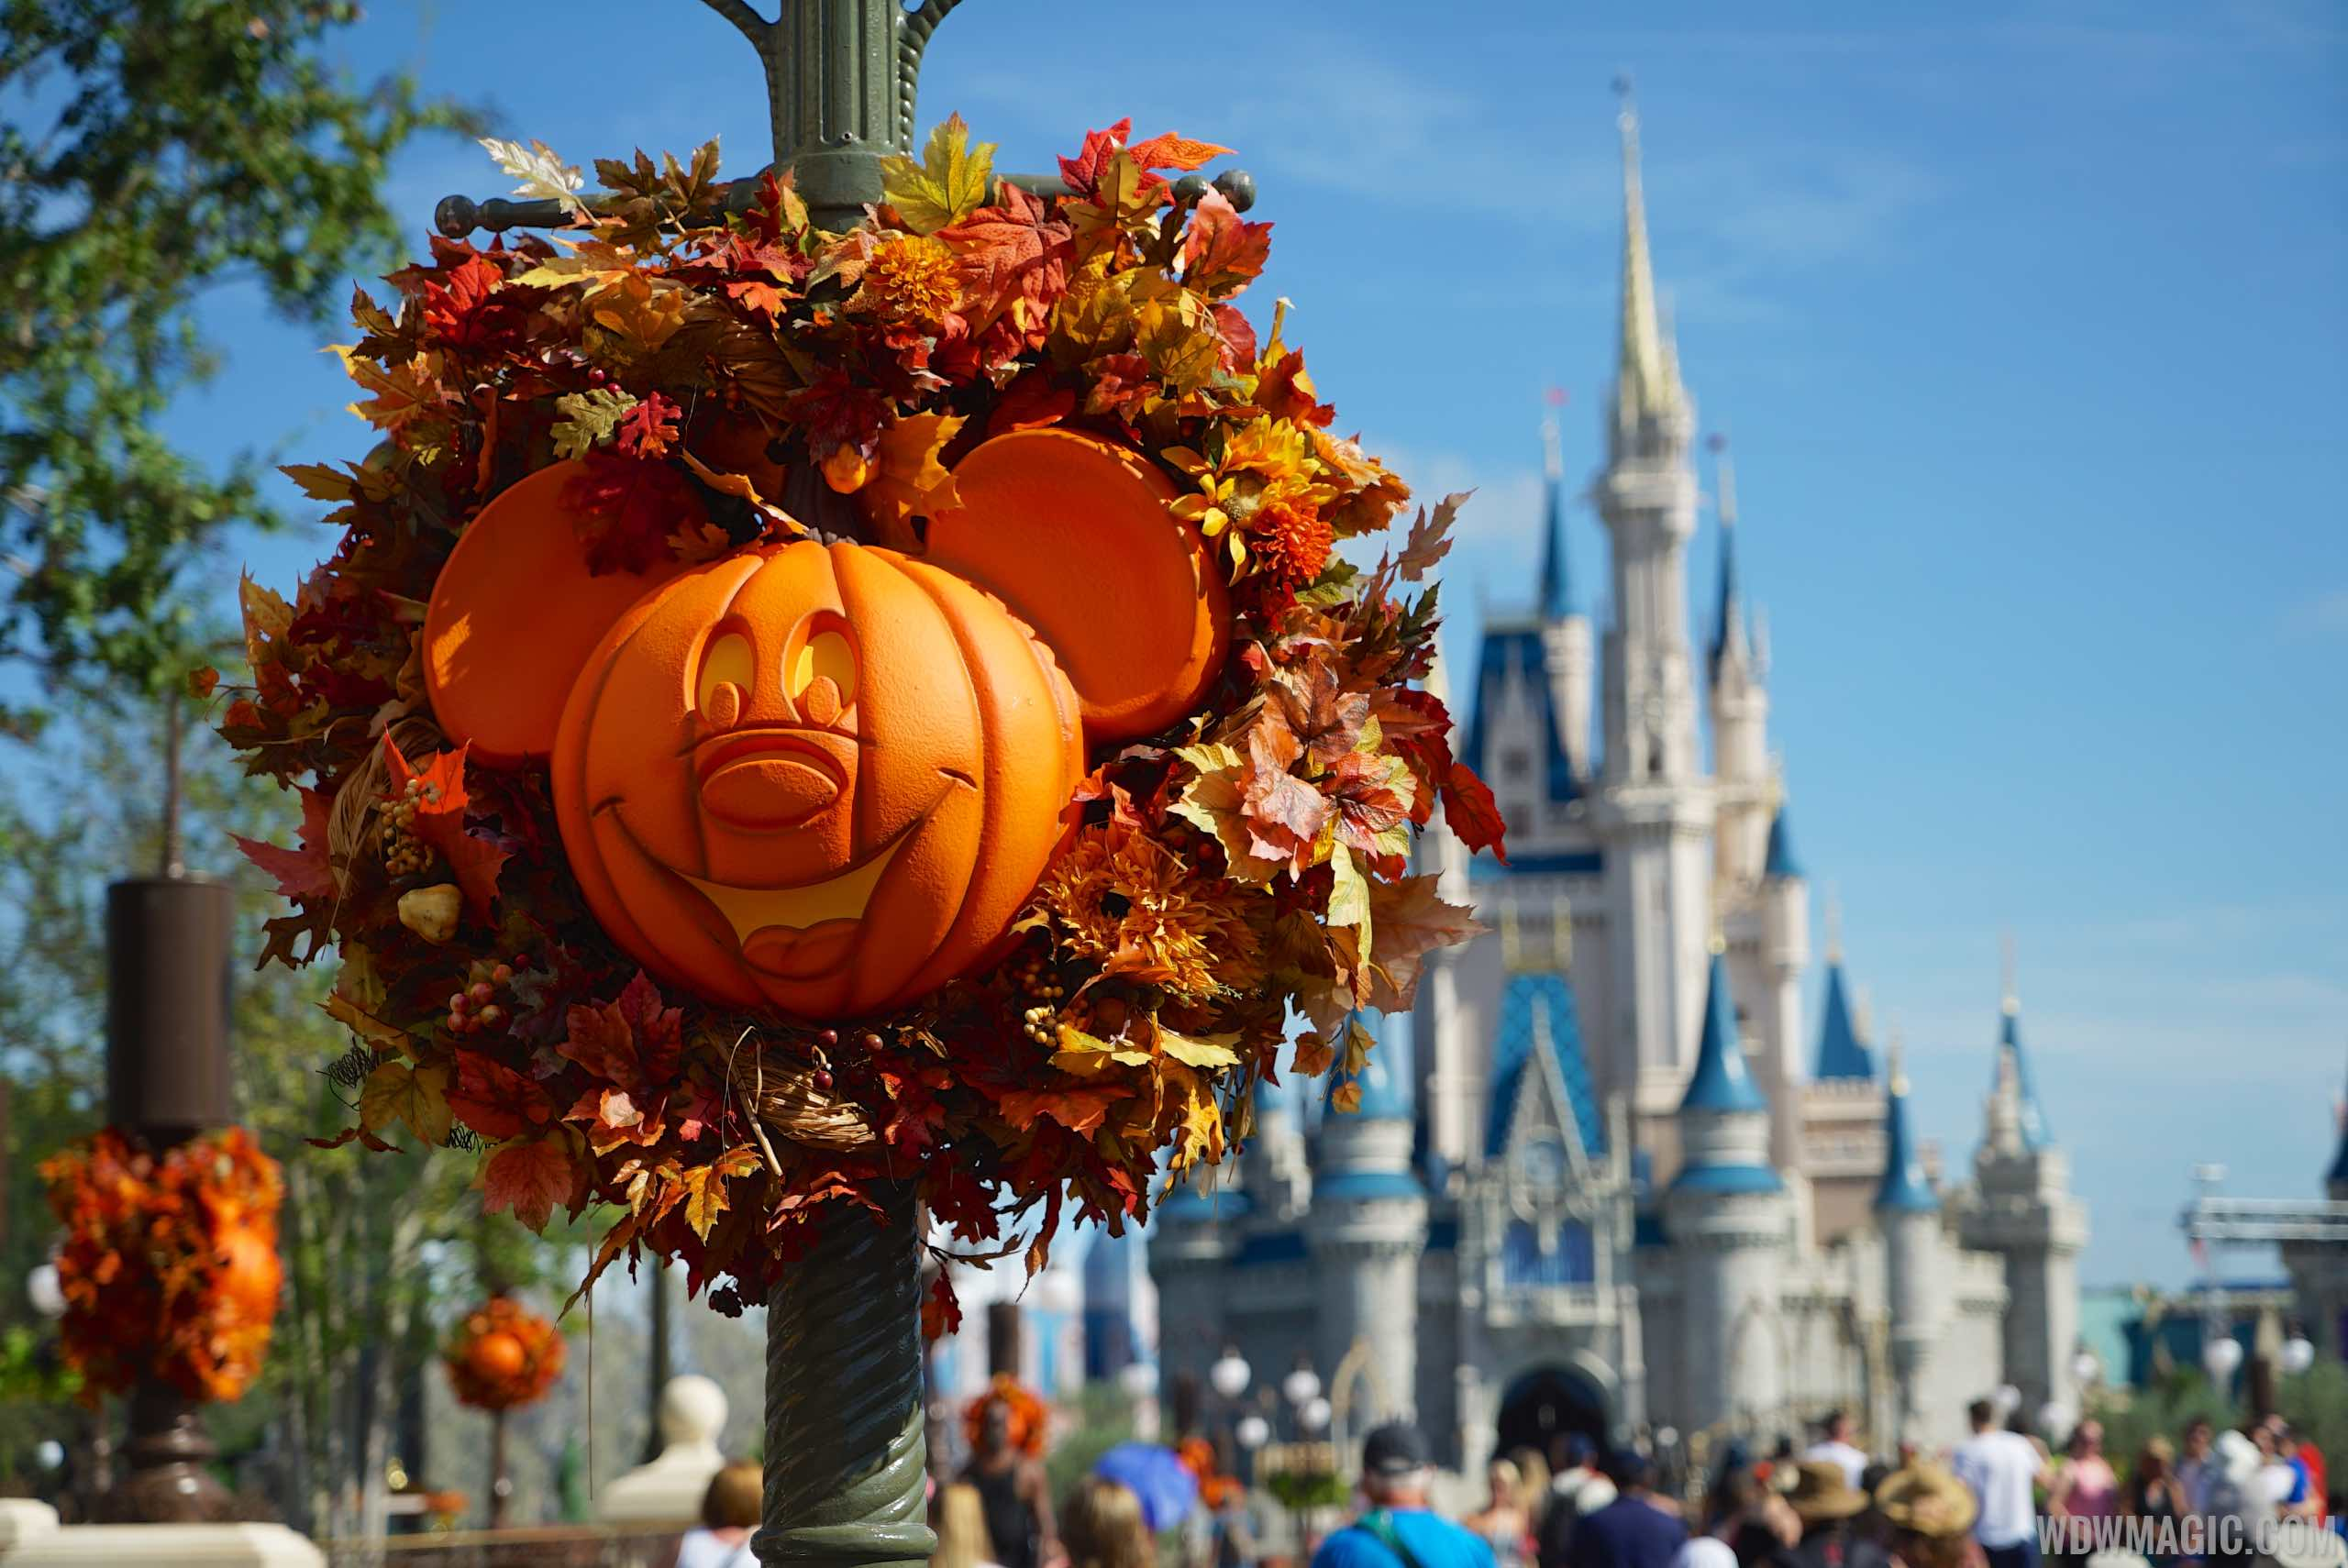 magic kingdoms fall halloween decorations 2015 photo 1 of 32 - Disney Halloween Decorations